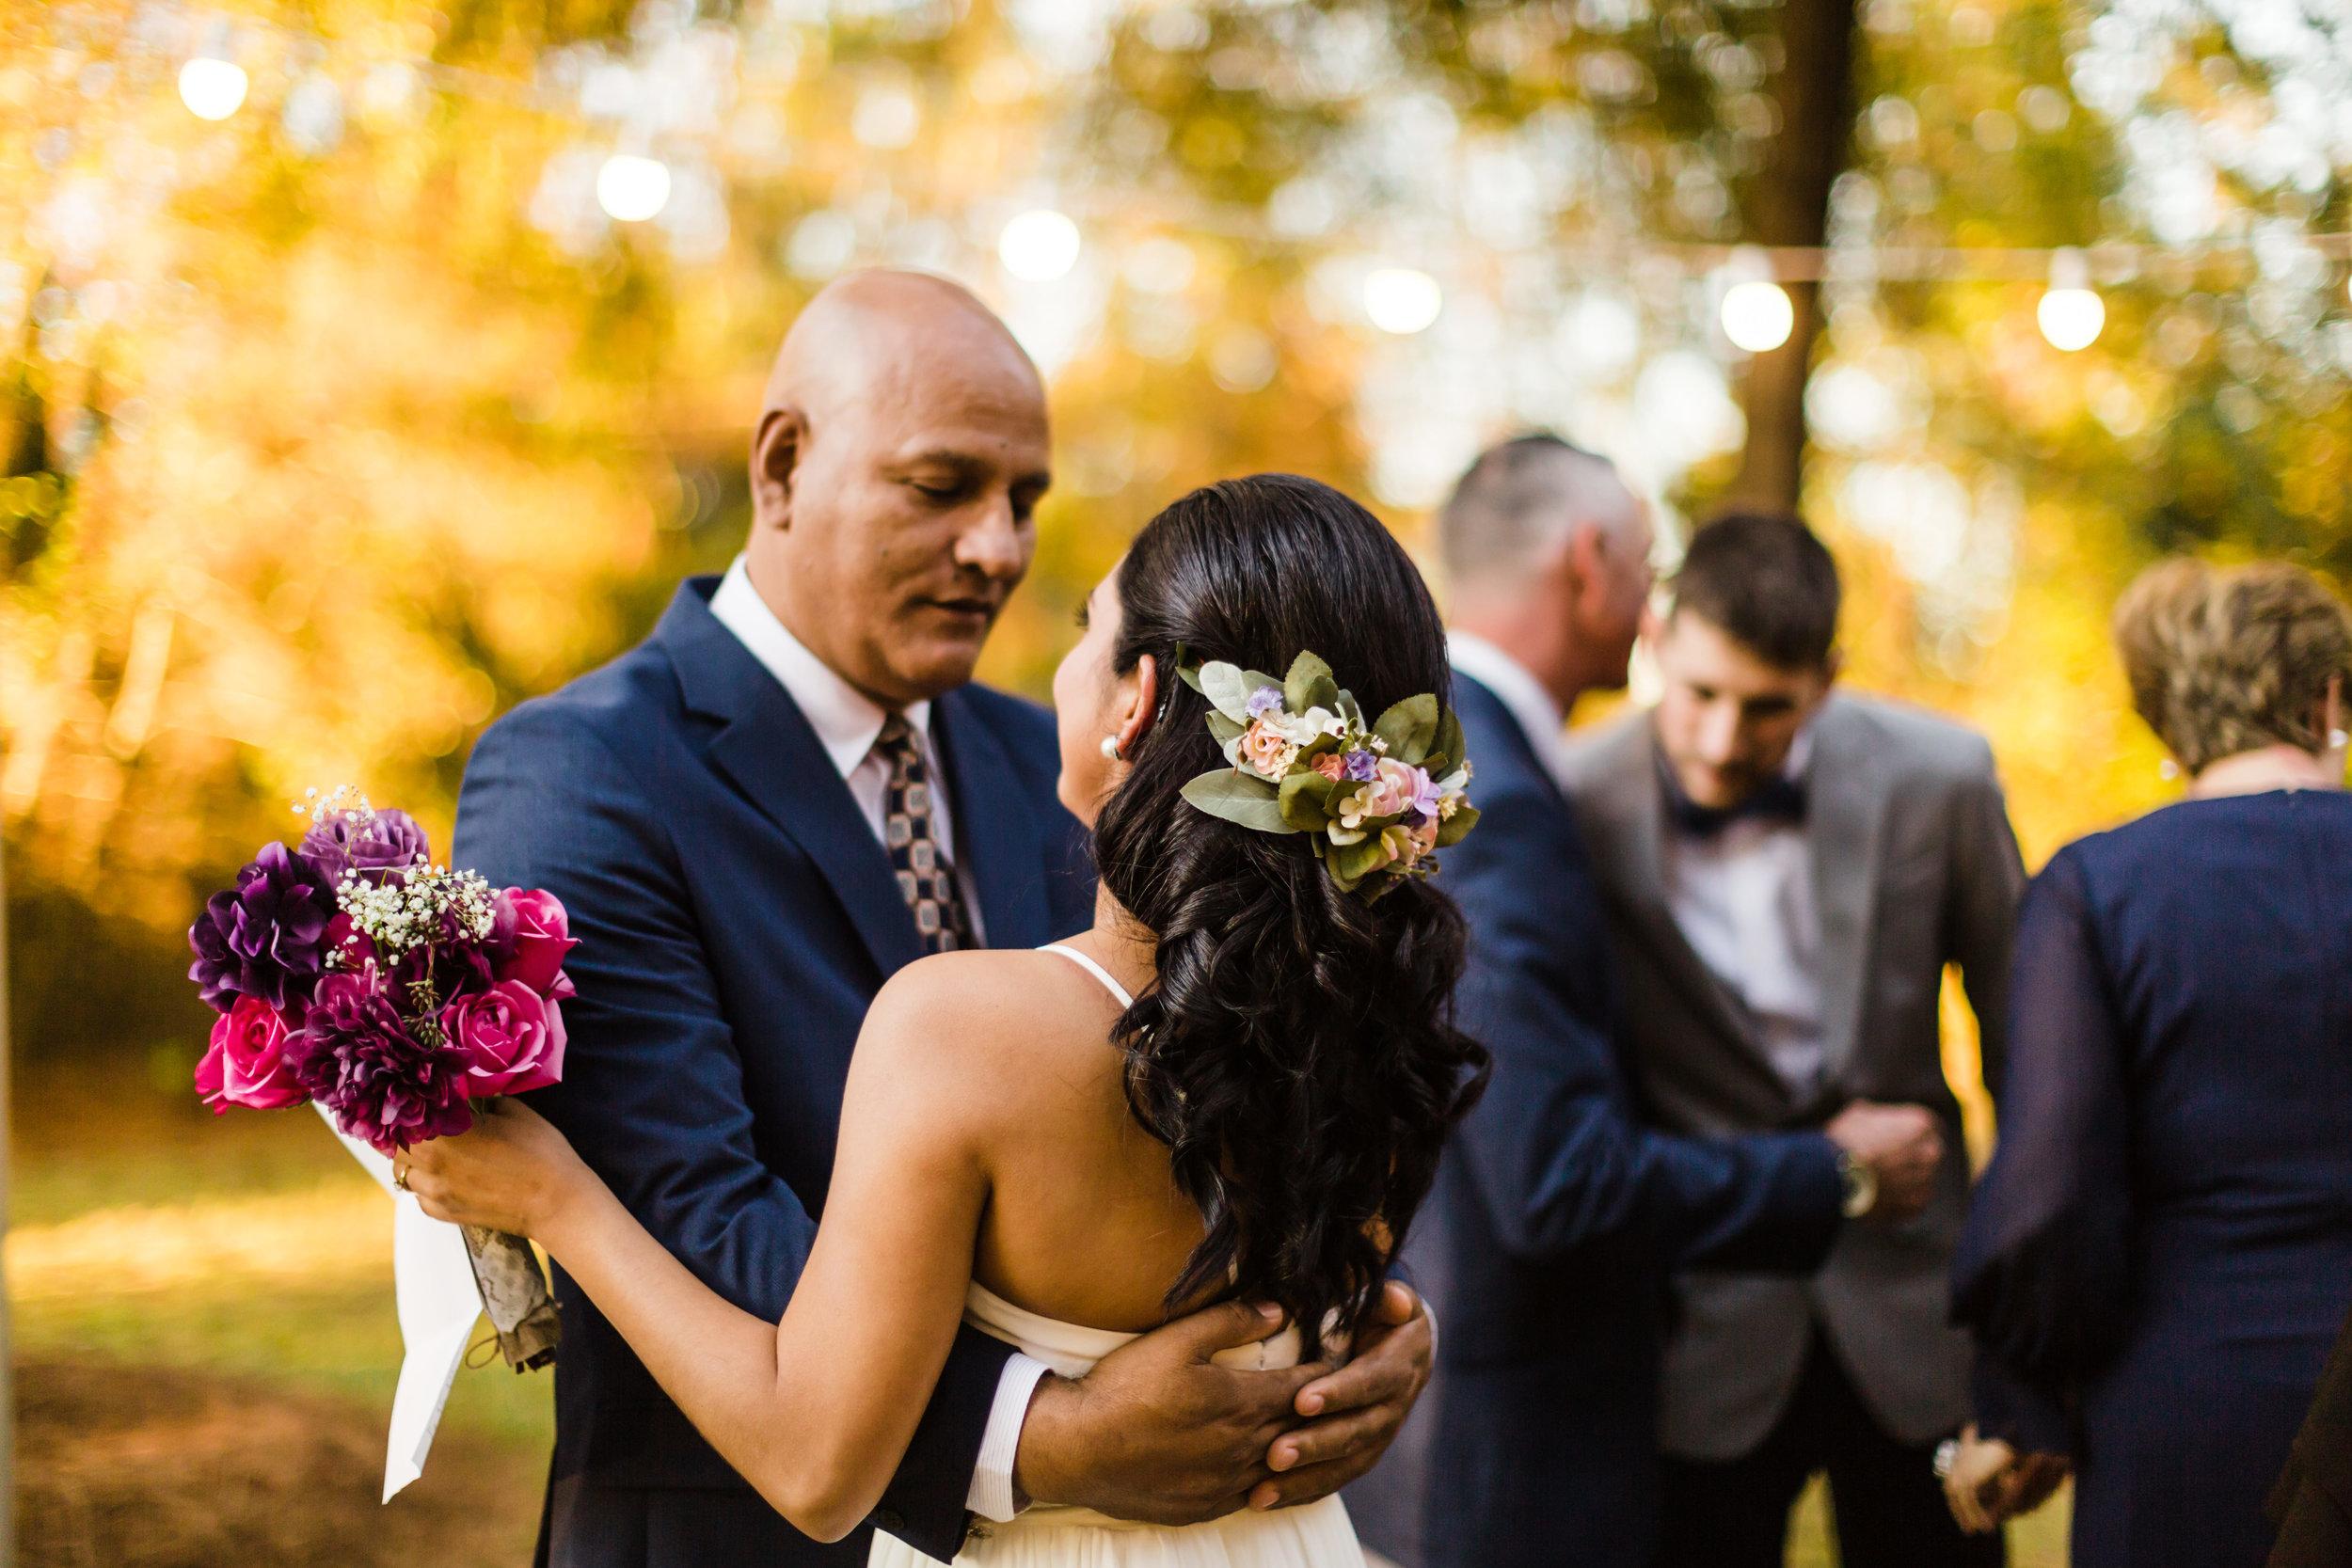 2018.11.03 Jael and Edel Ocala Wedding FINALS (270 of 441).jpg